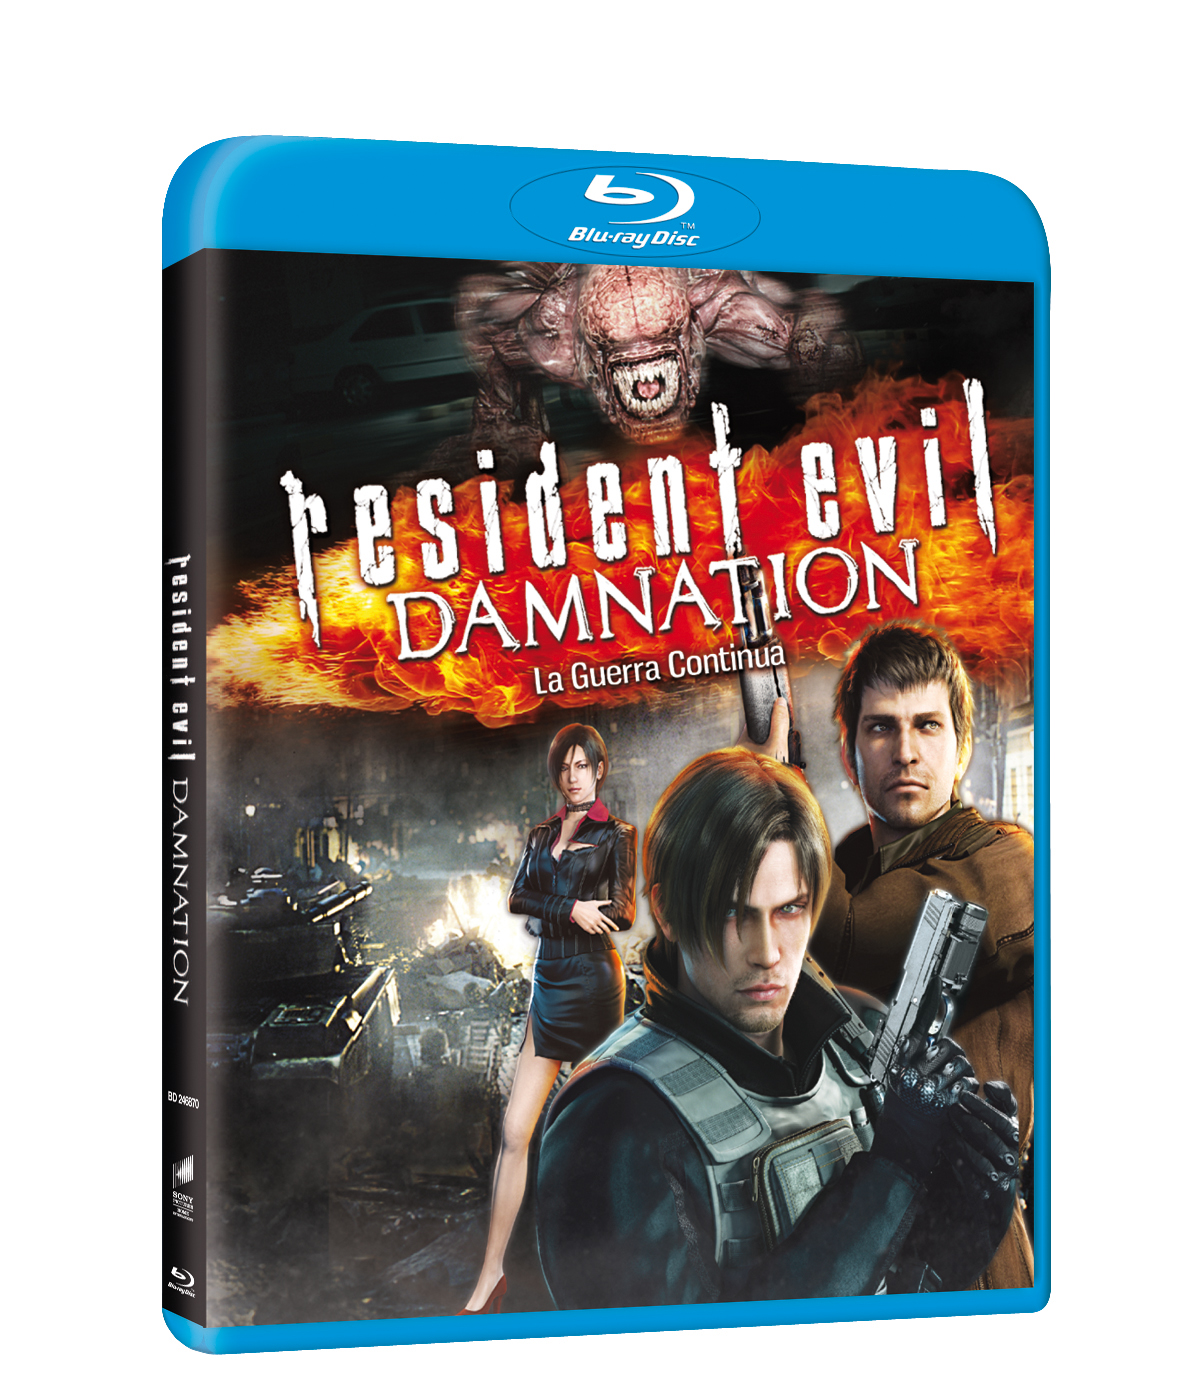 Resident evil damnation blu-ray